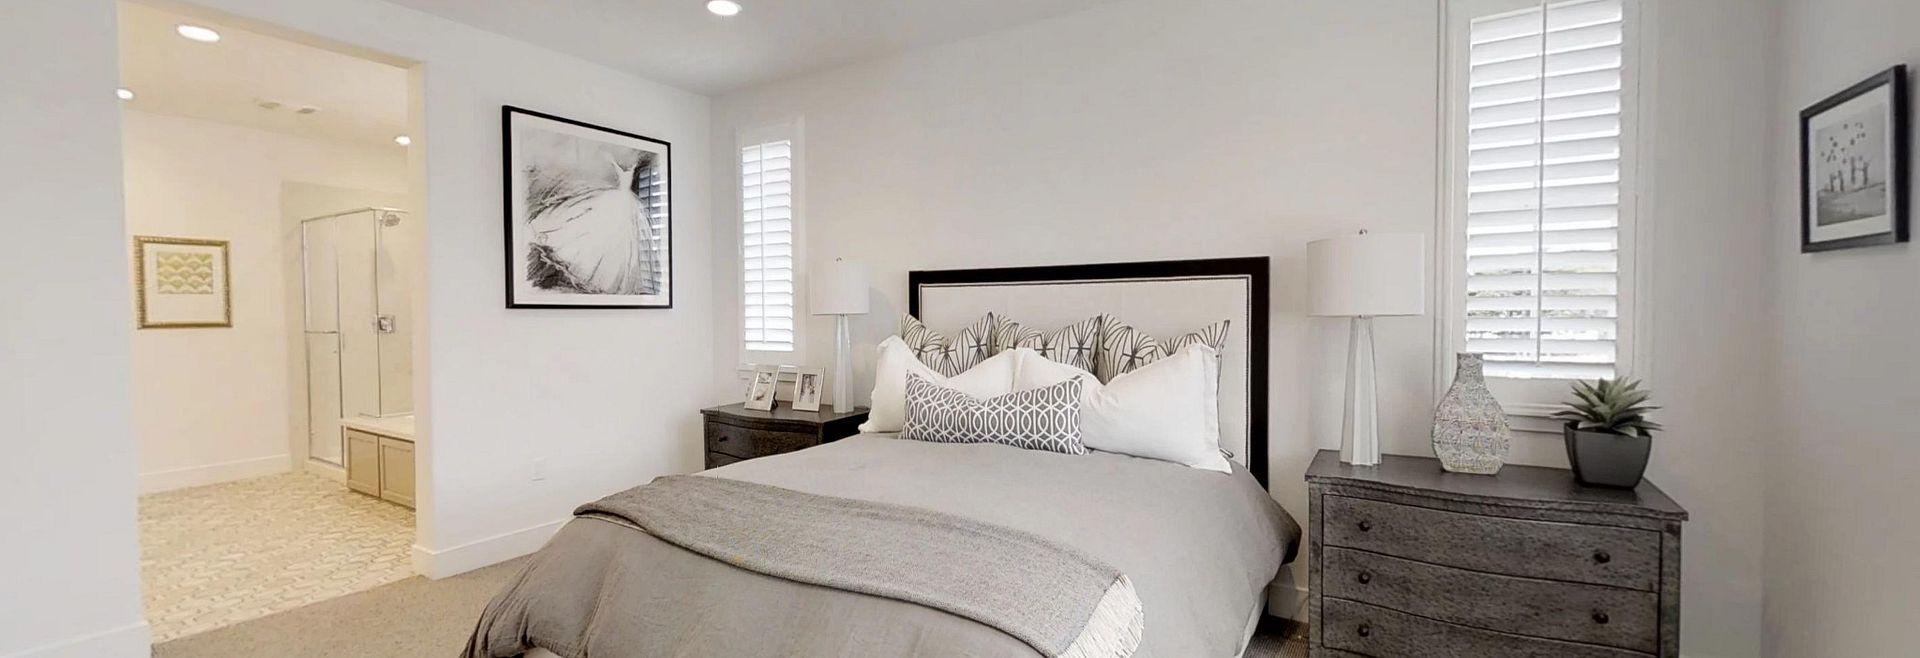 Boat House Plan 2 Master Bedroom